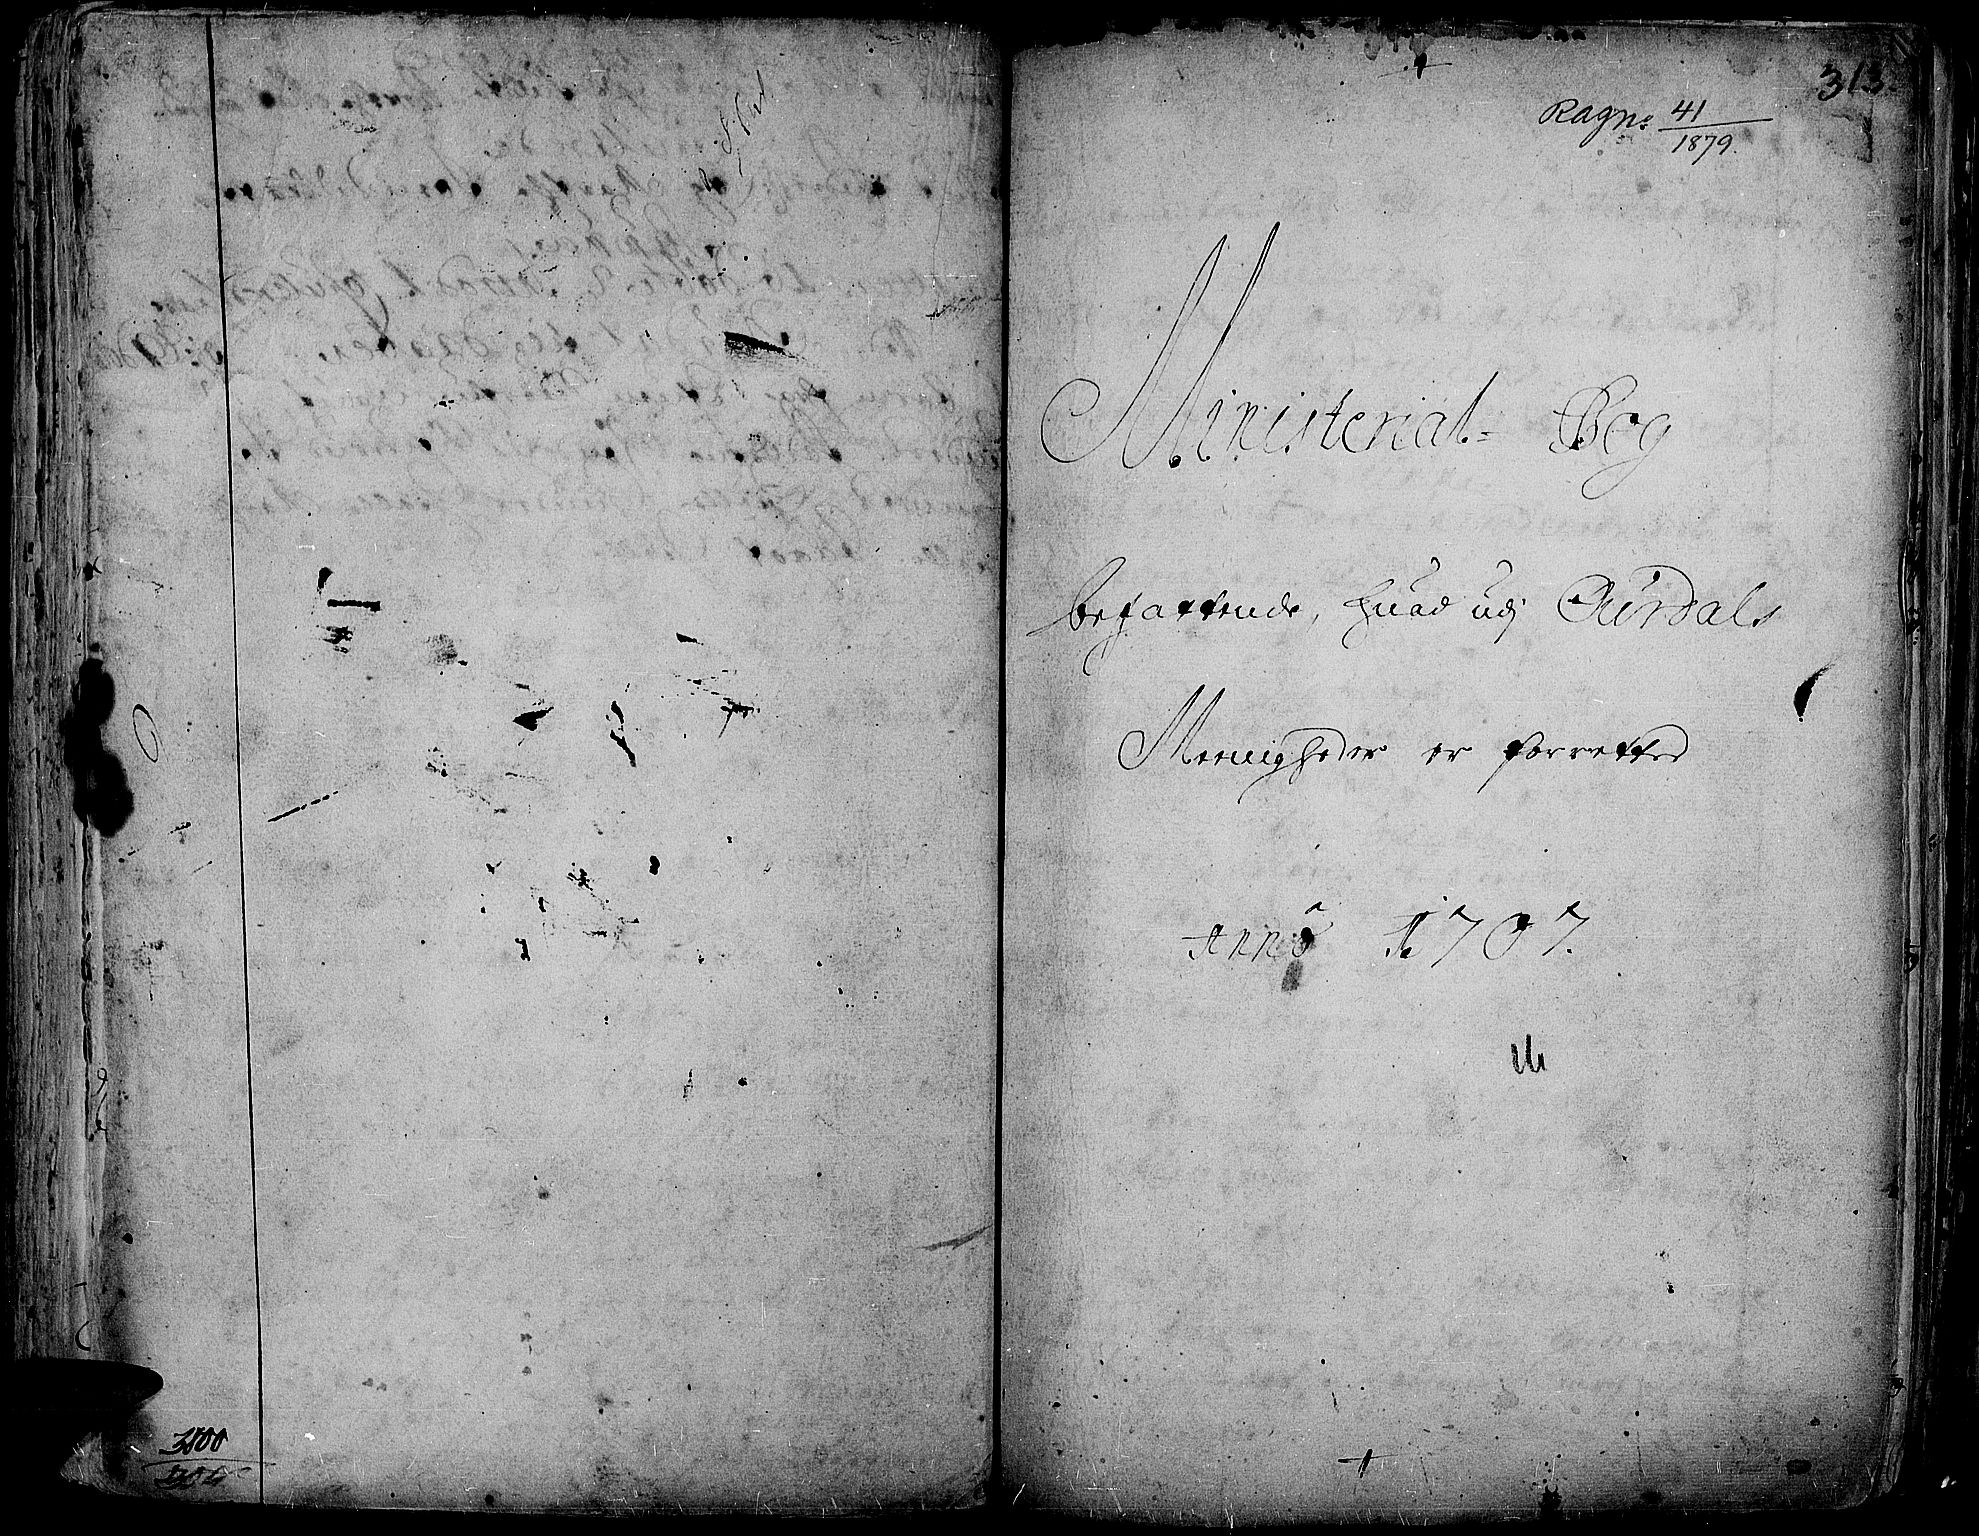 SAH, Aurdal prestekontor, Ministerialbok nr. 1-3, 1692-1730, s. 313